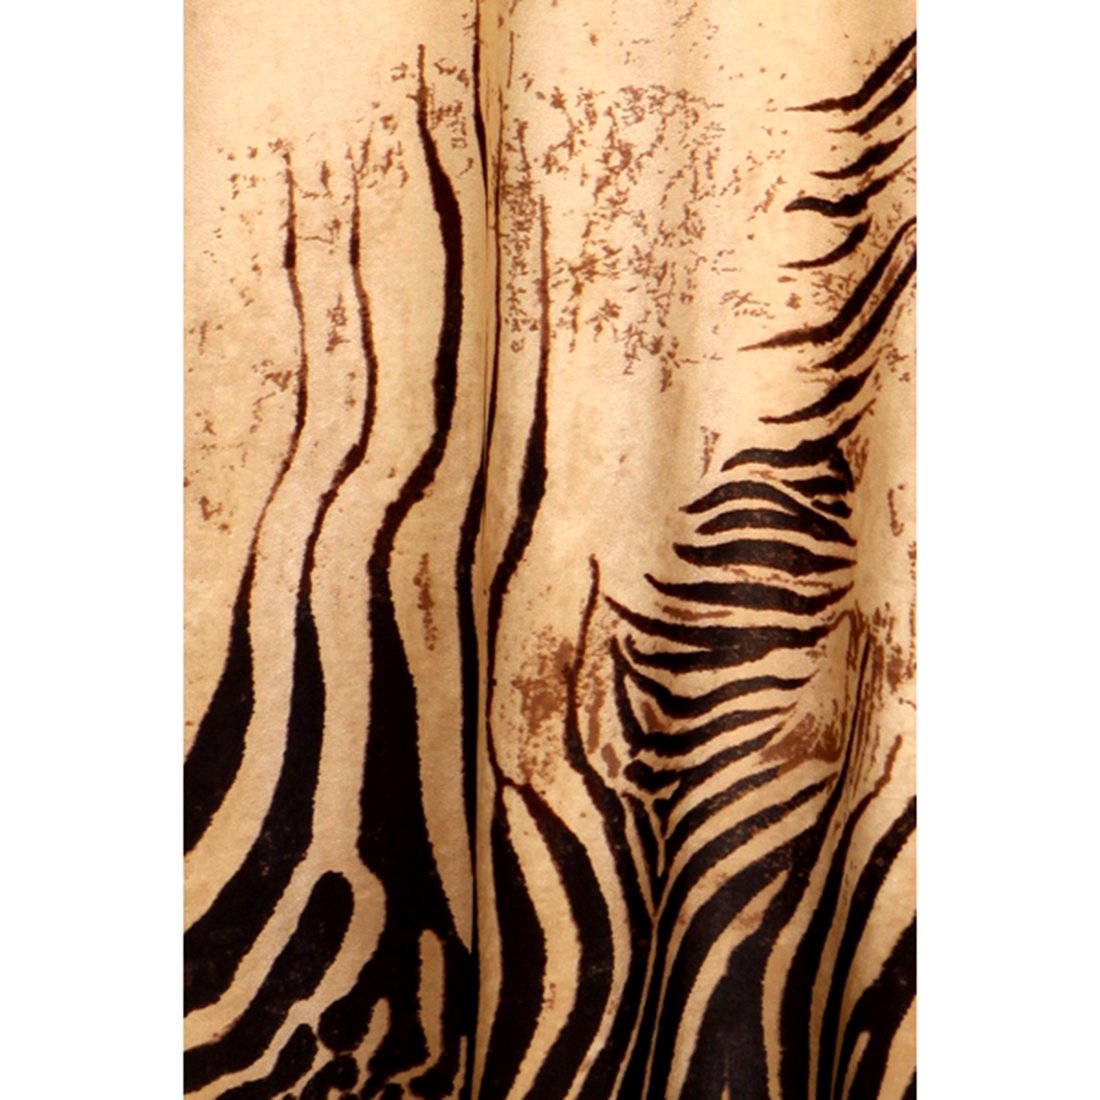 6d60a48b4c1 Crazy4Bling Plus Size Zebra Print High Waist Maxi Skirt in Brown Tones